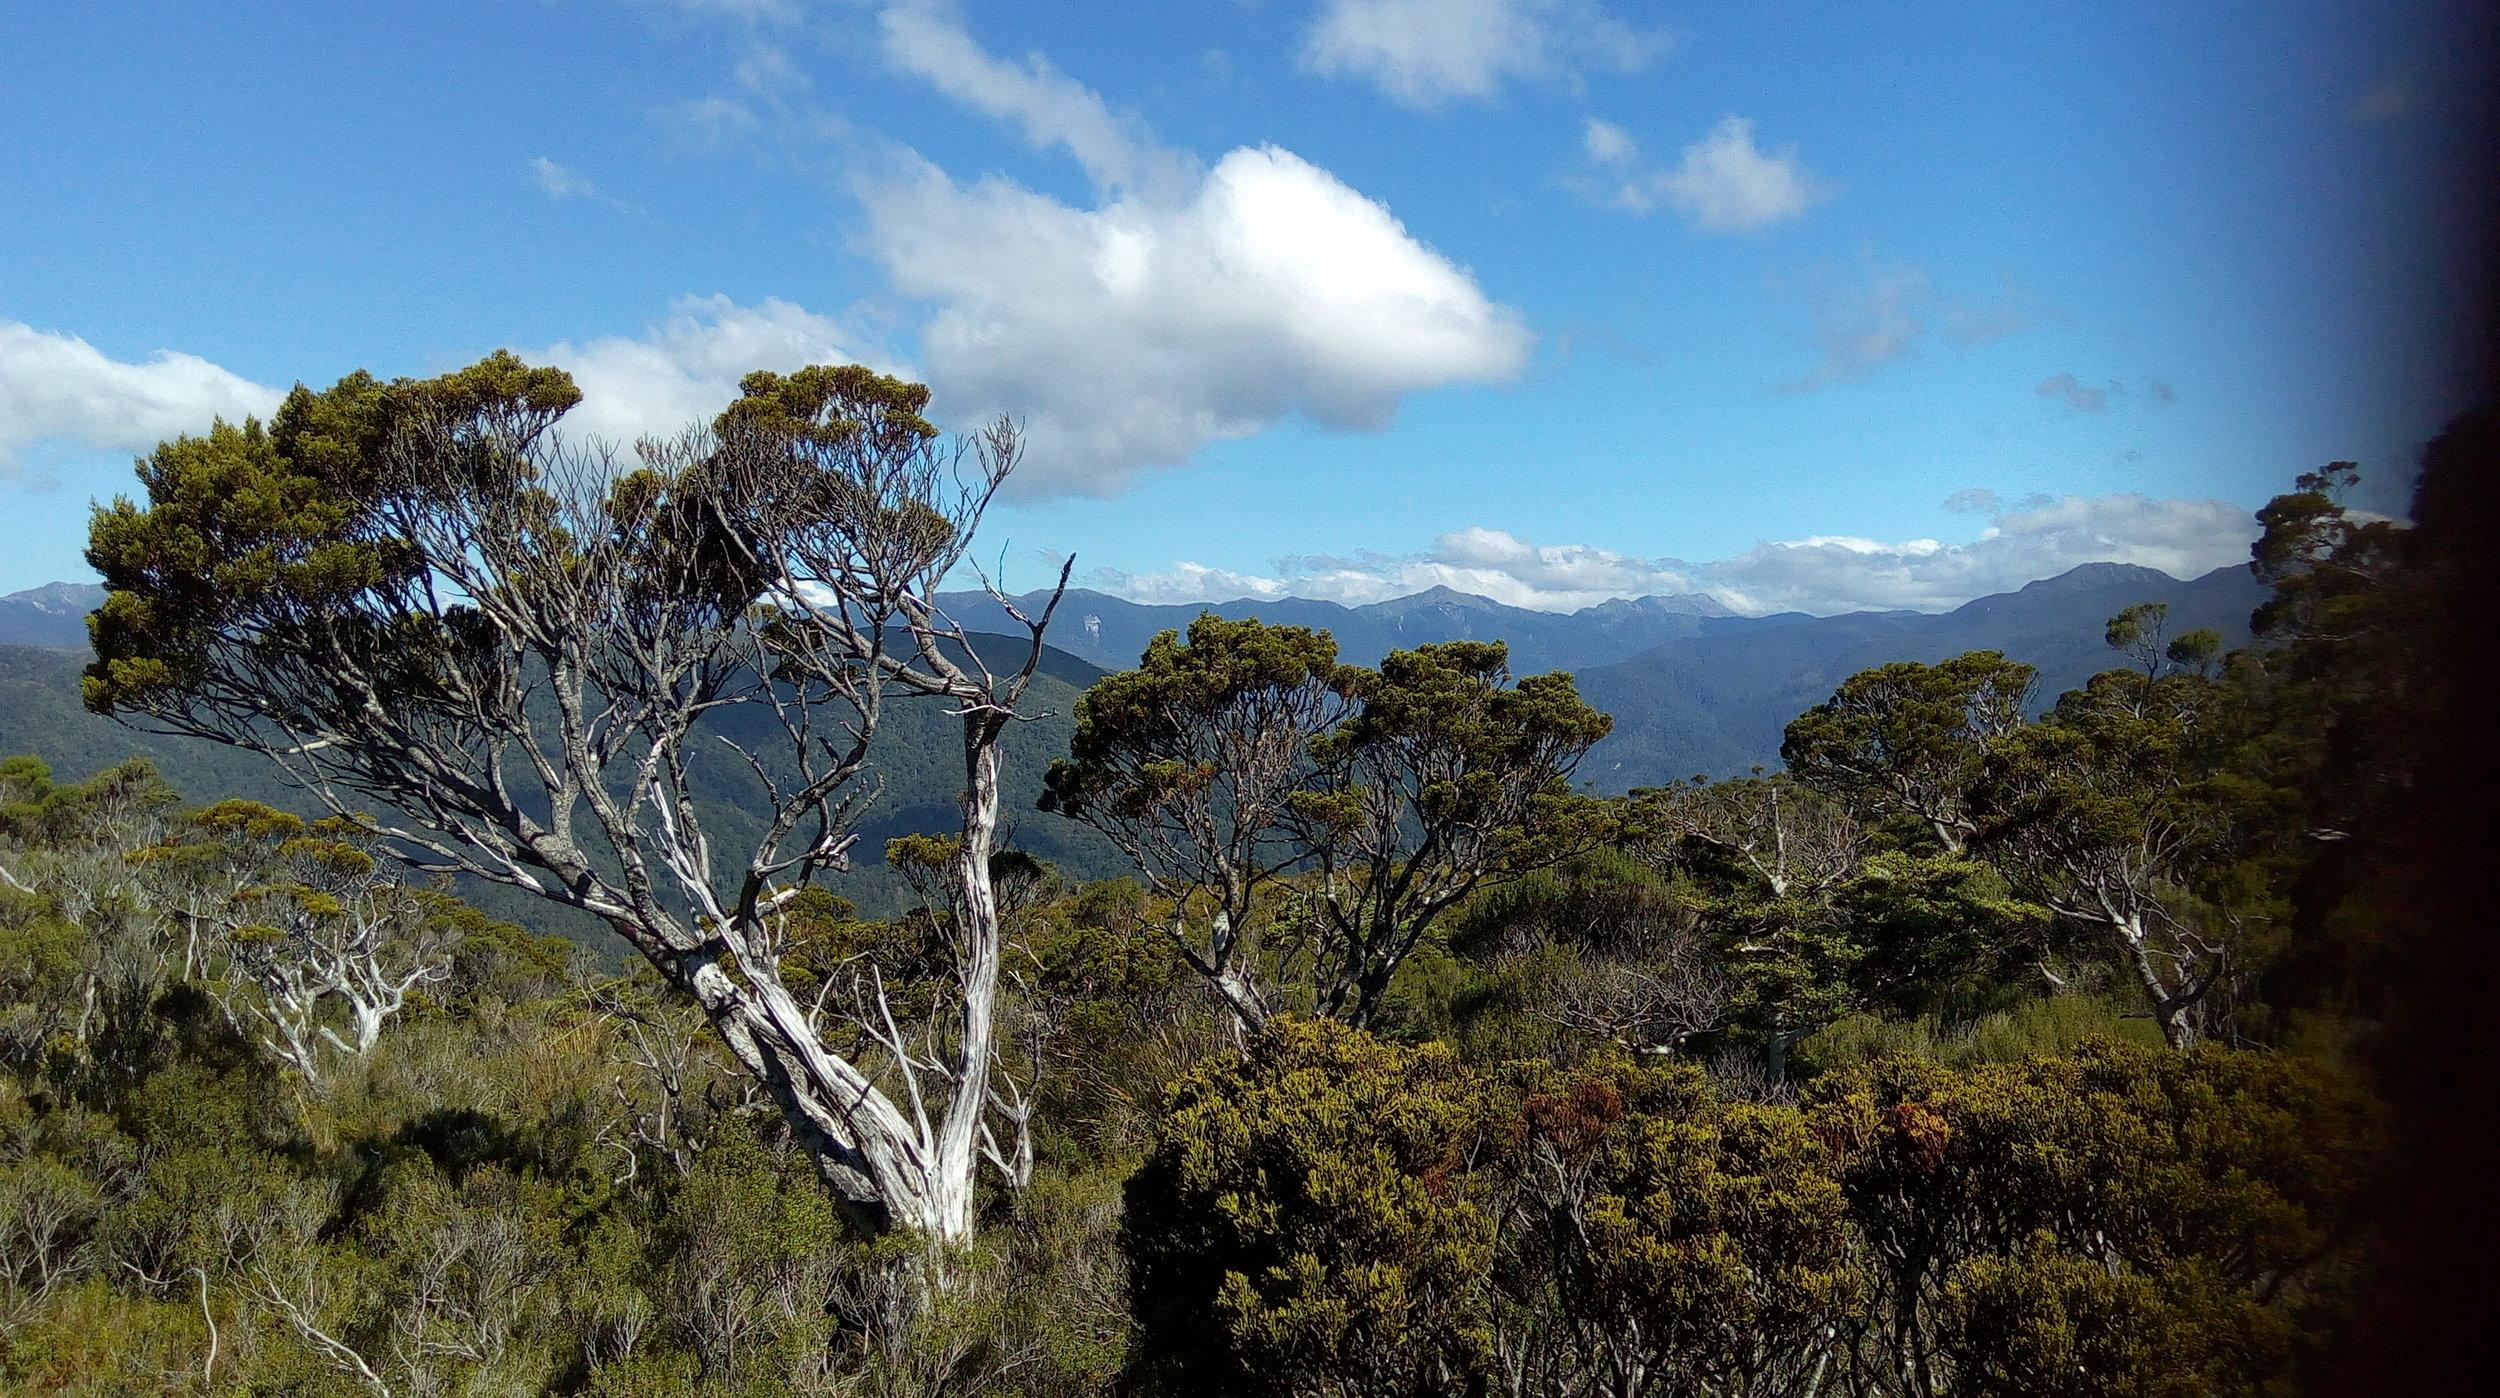 A short run alone thru bush led to this opening revealing the vast Tasman wilderness area.